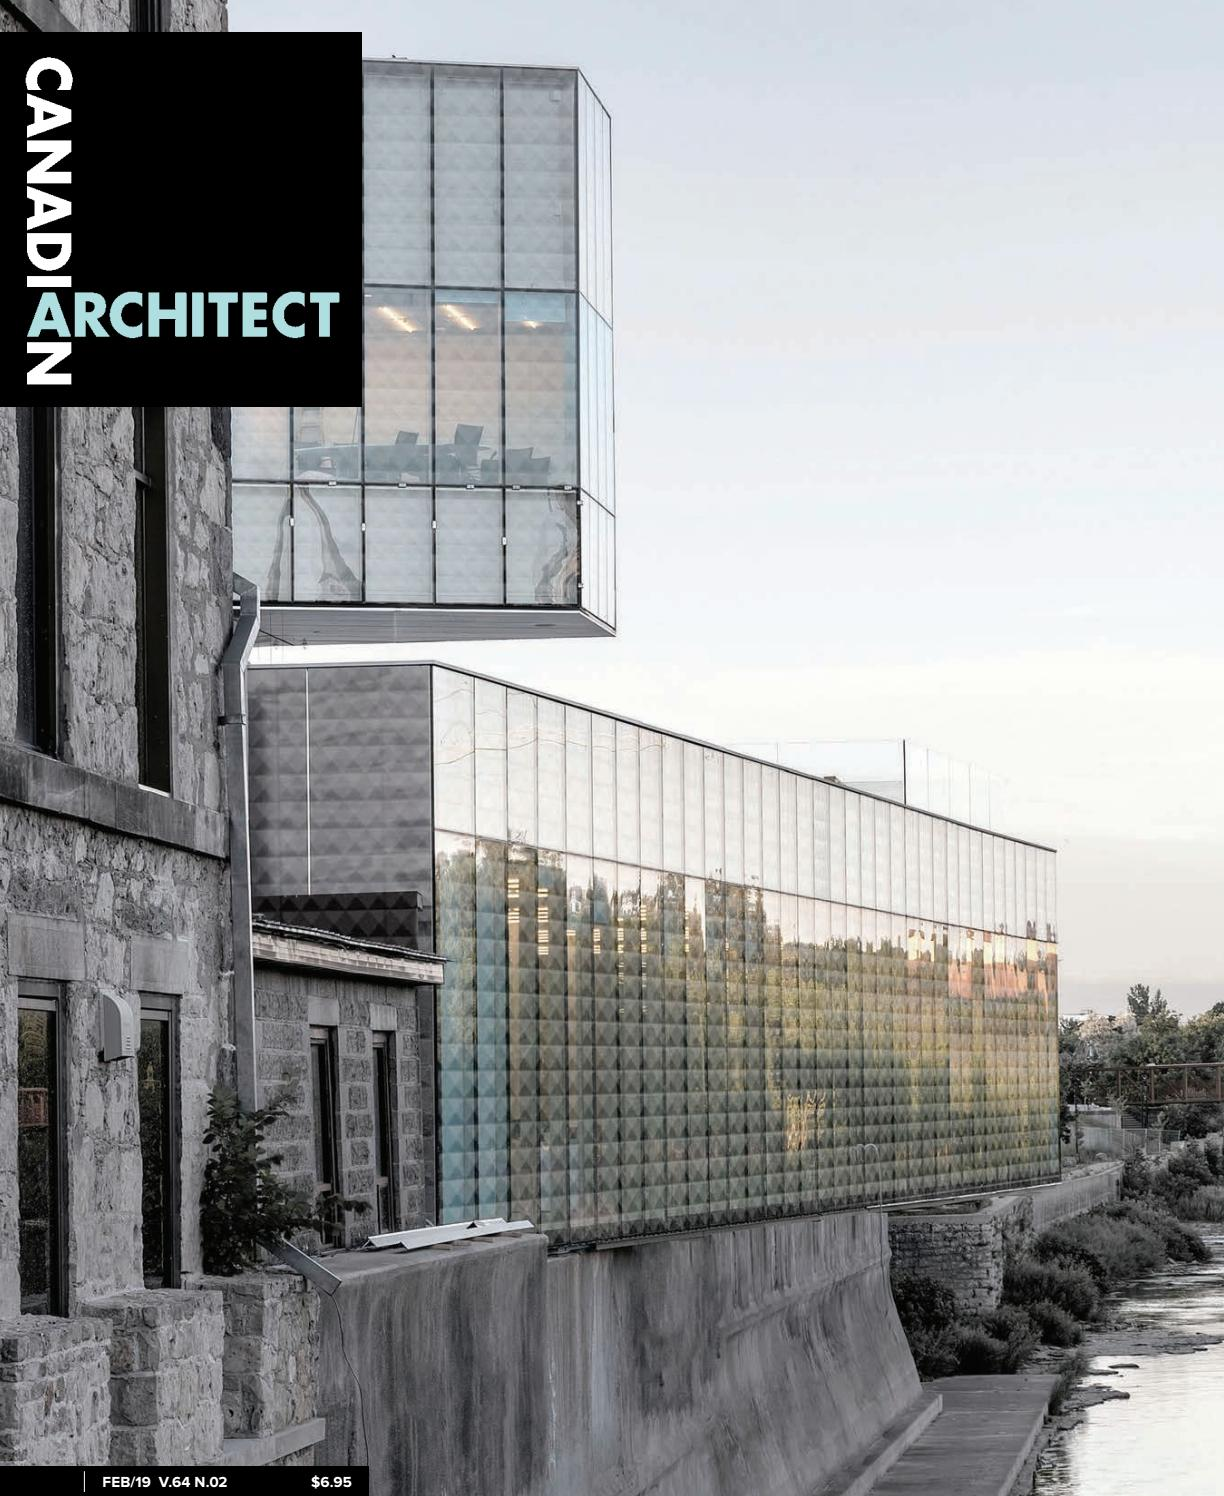 Echelle Bibliotheque Sur Rail canadian architect february 2019iq business media - issuu